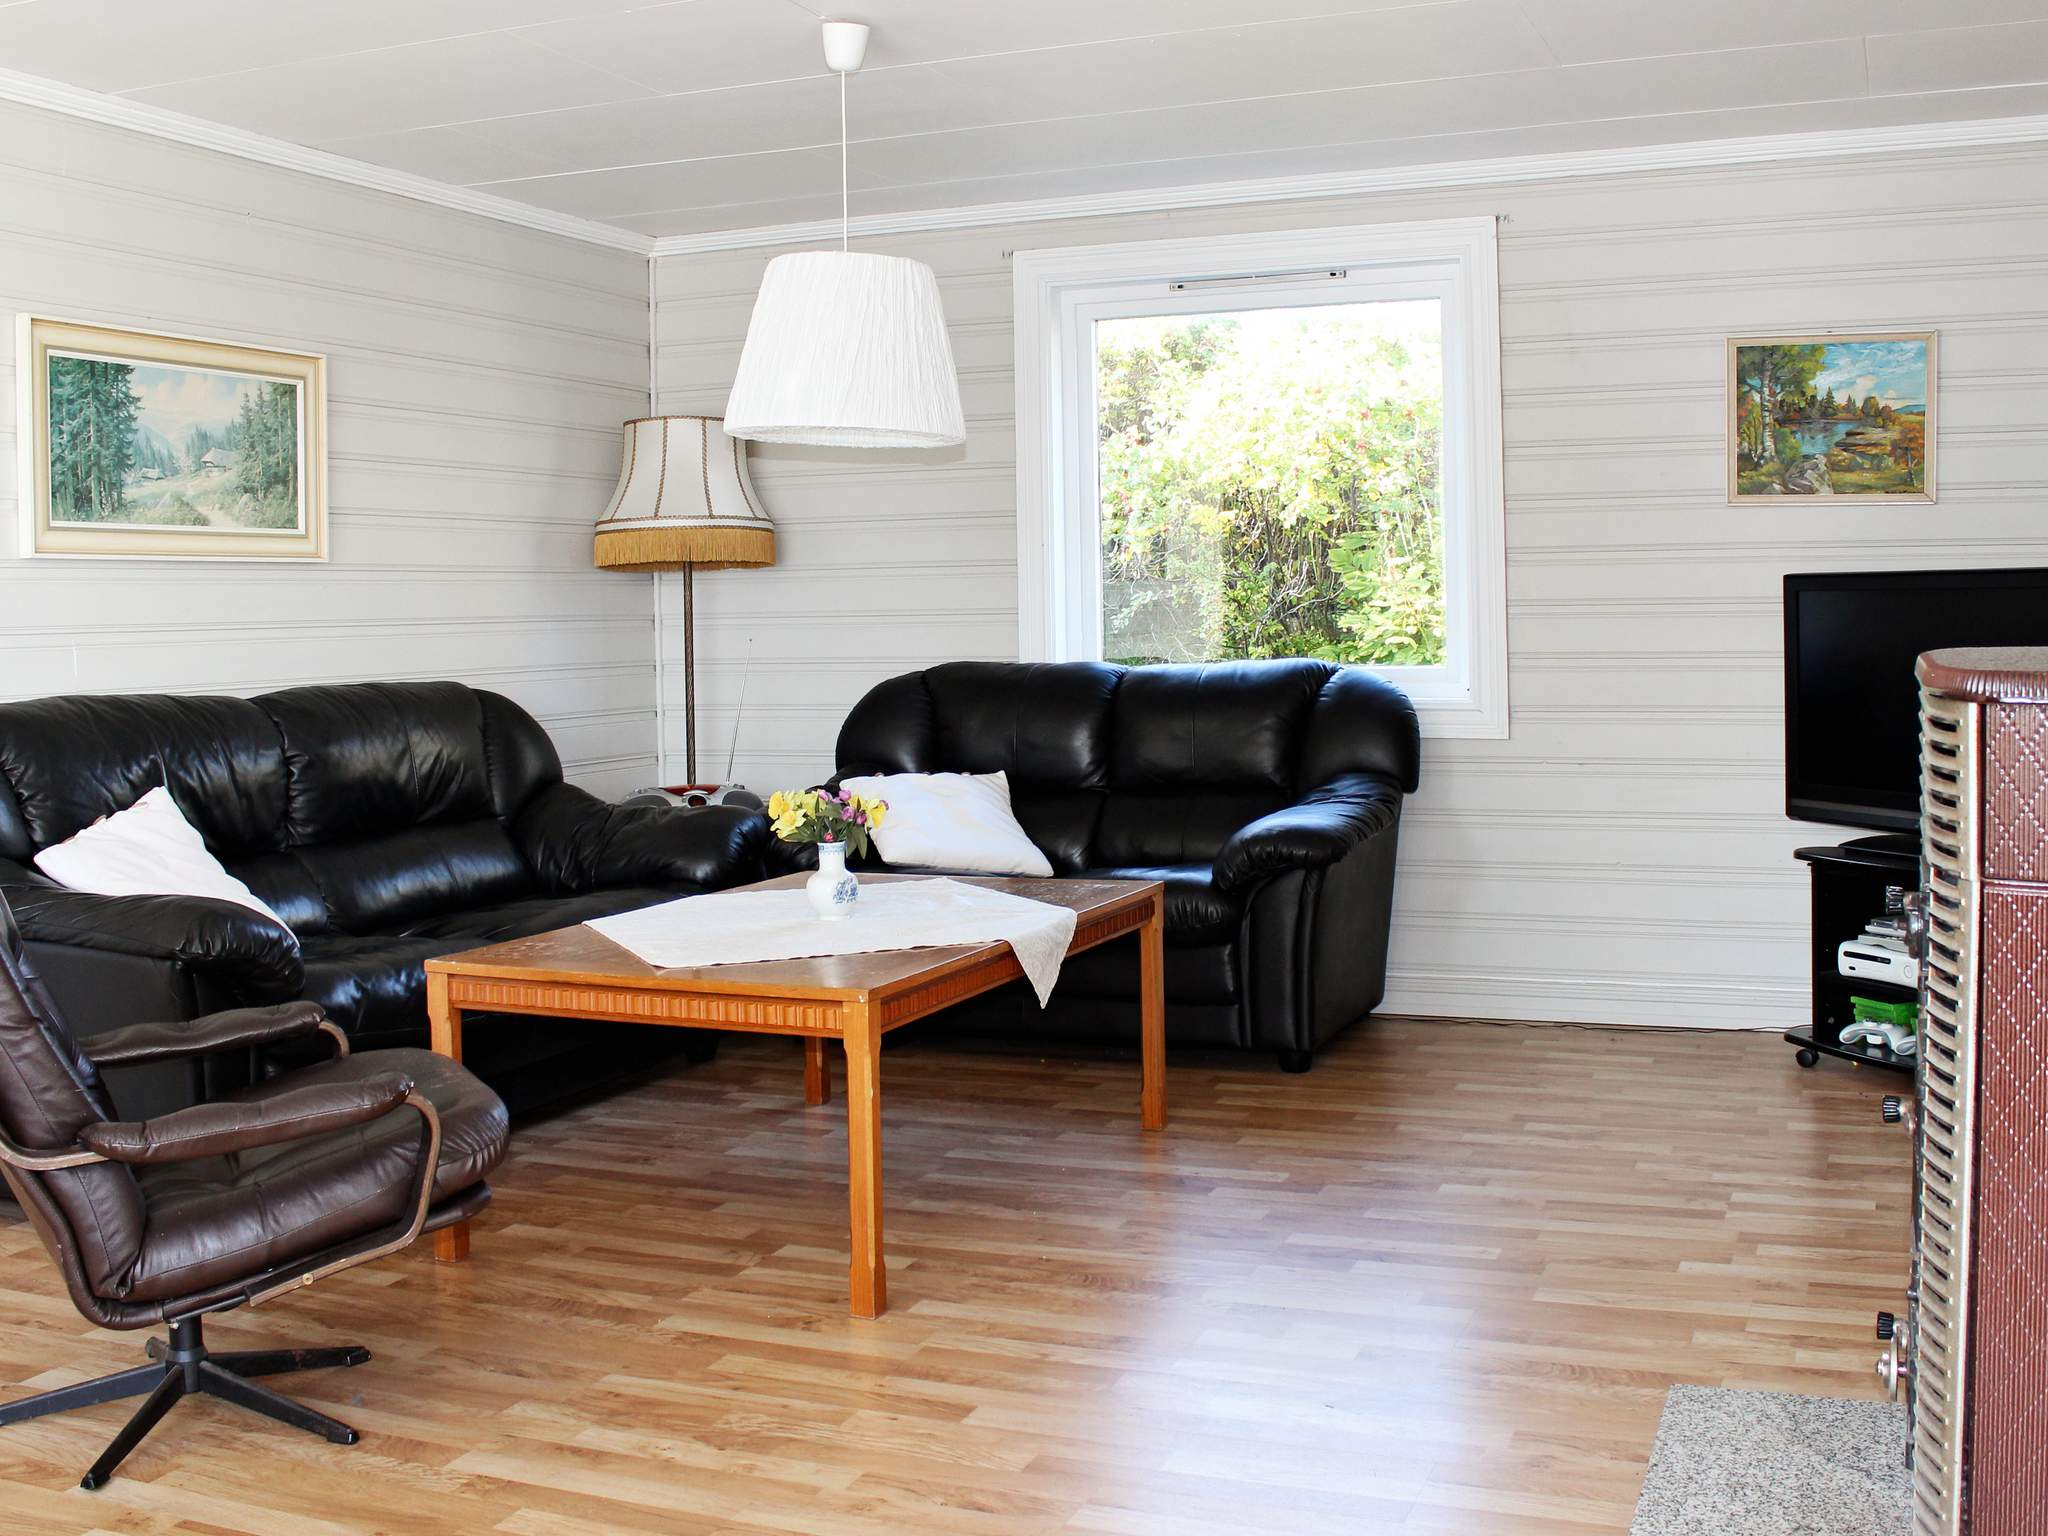 Ferienhaus Vevang (85080), Vevang, More - Romsdal, Westnorwegen, Norwegen, Bild 47